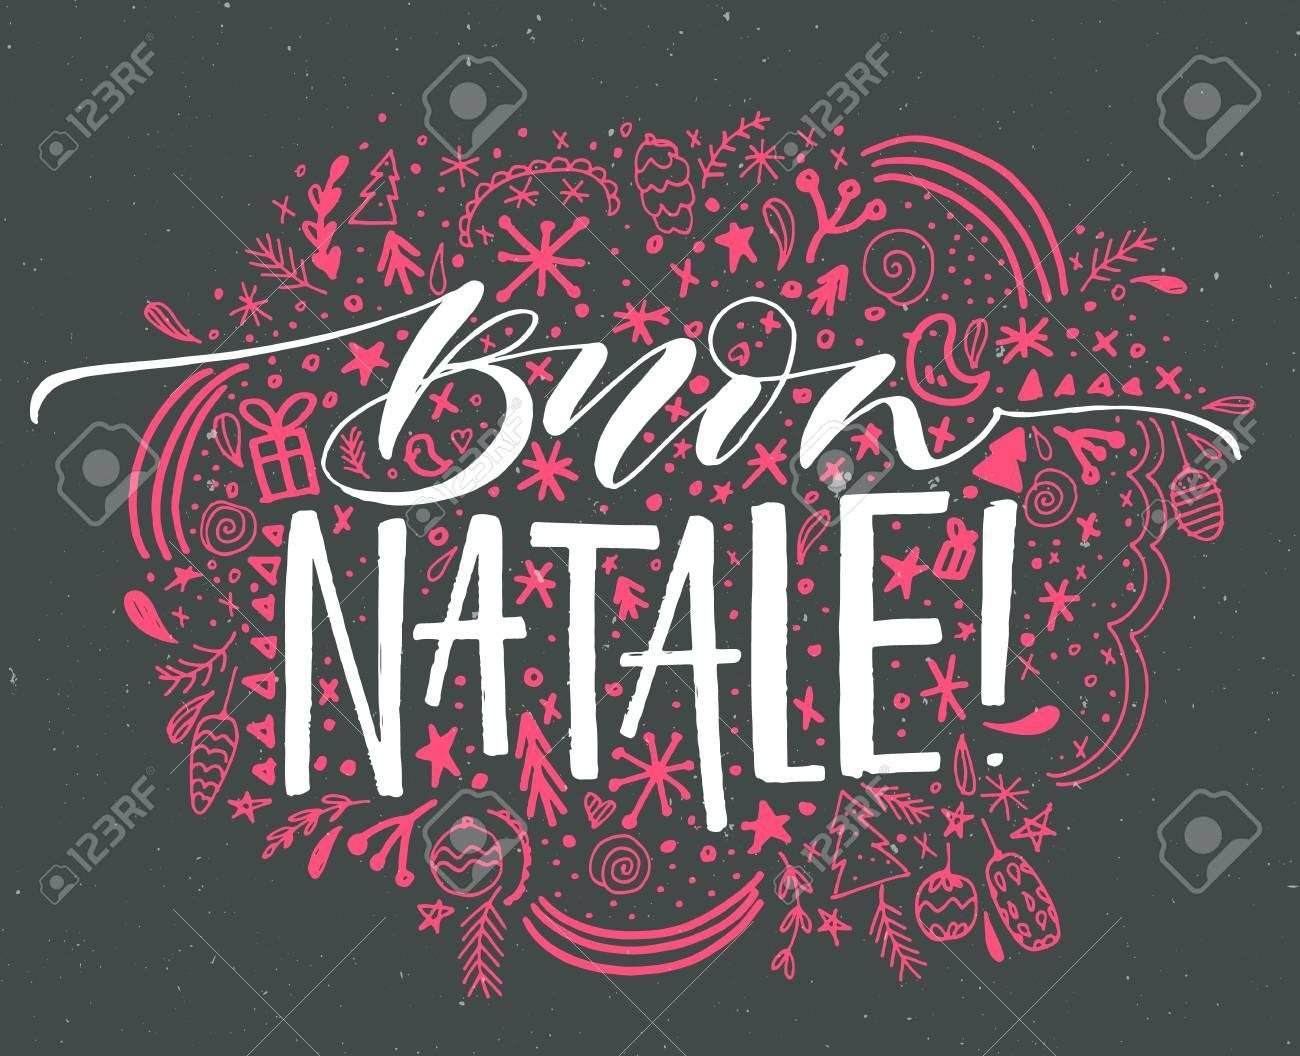 Buon Natale Ornament.Buon Natale Italian Merry Christmas Text Vector Greeting Card